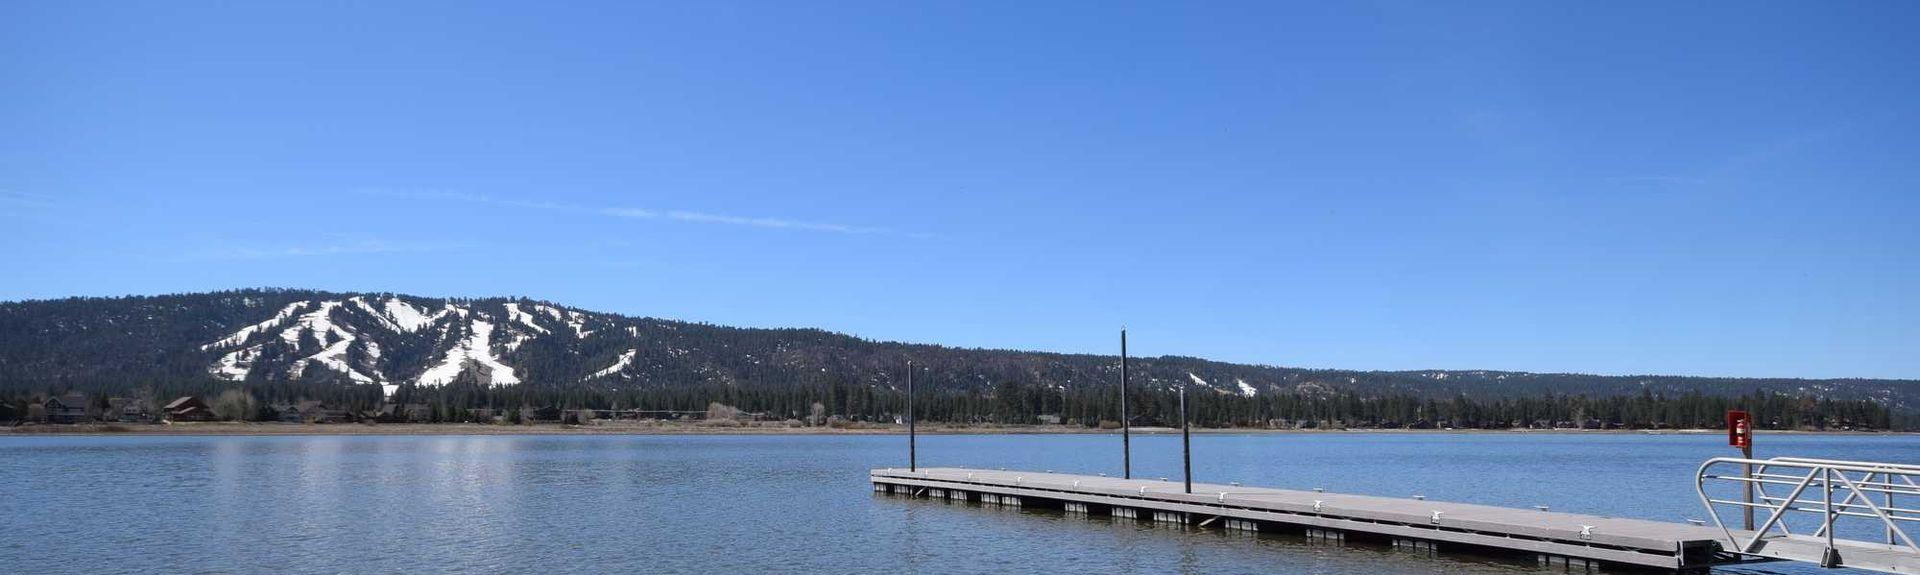 Upper Moonridge, Moonridge, Big Bear Lake, CA, USA